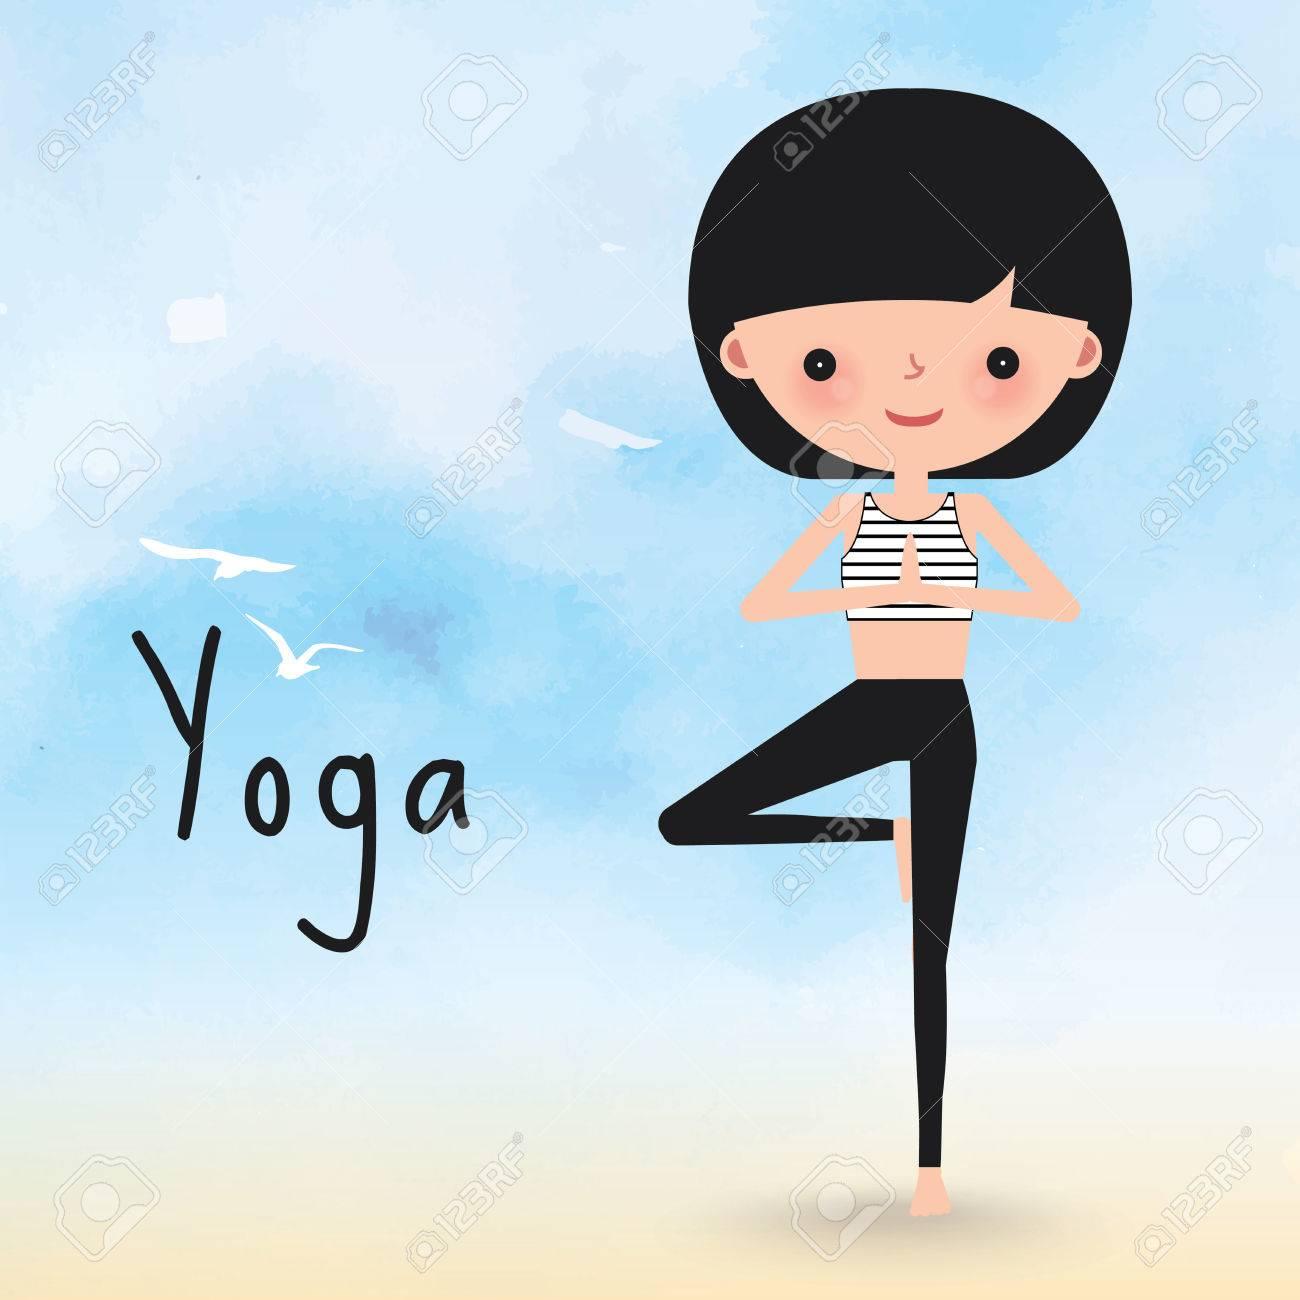 Yoga Woman Surya Namaskar On The Beach Cartoon Royalty Free Cliparts Vectors And Stock Illustration Image 46420317